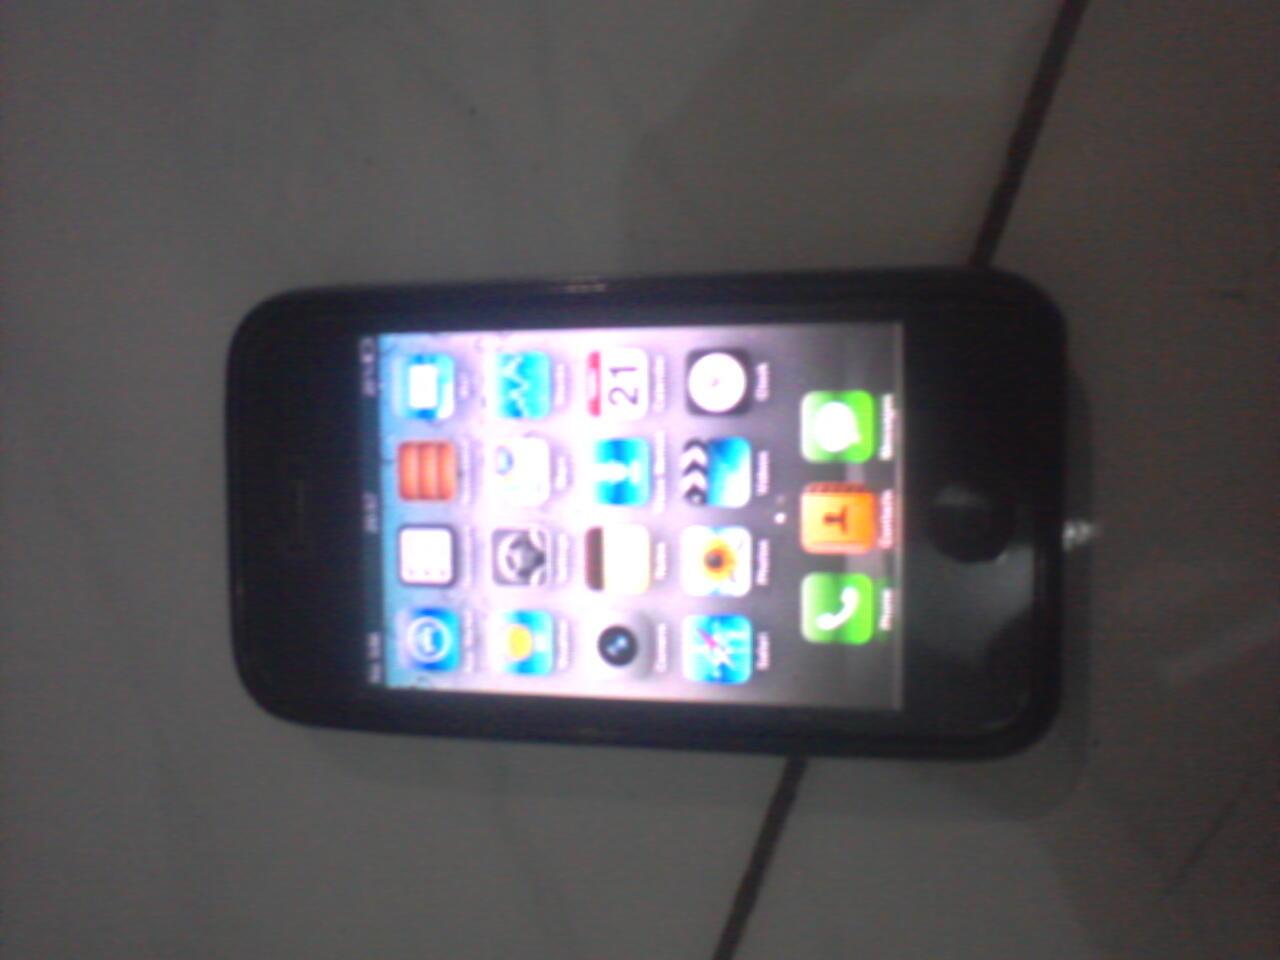 Iphone 3gs (batangan ganss)